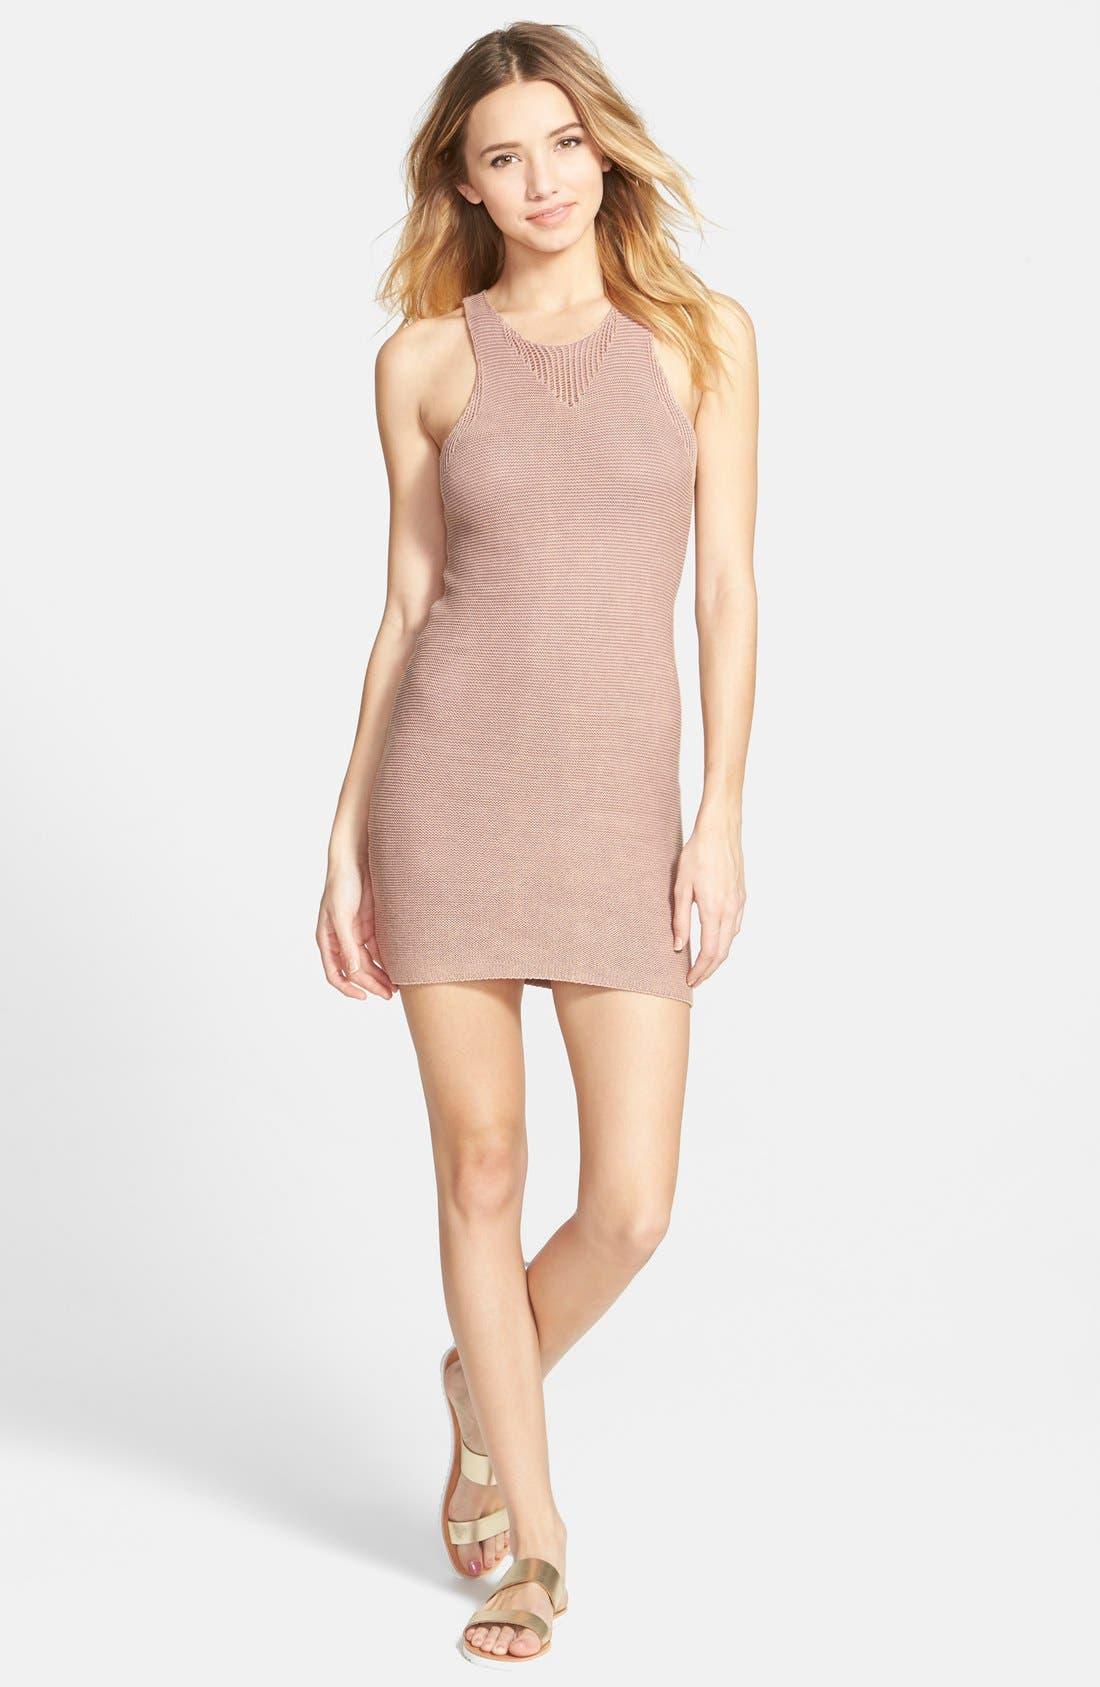 Alternate Image 1 Selected - RVCA 'Camino Cruisin' Knit Dress